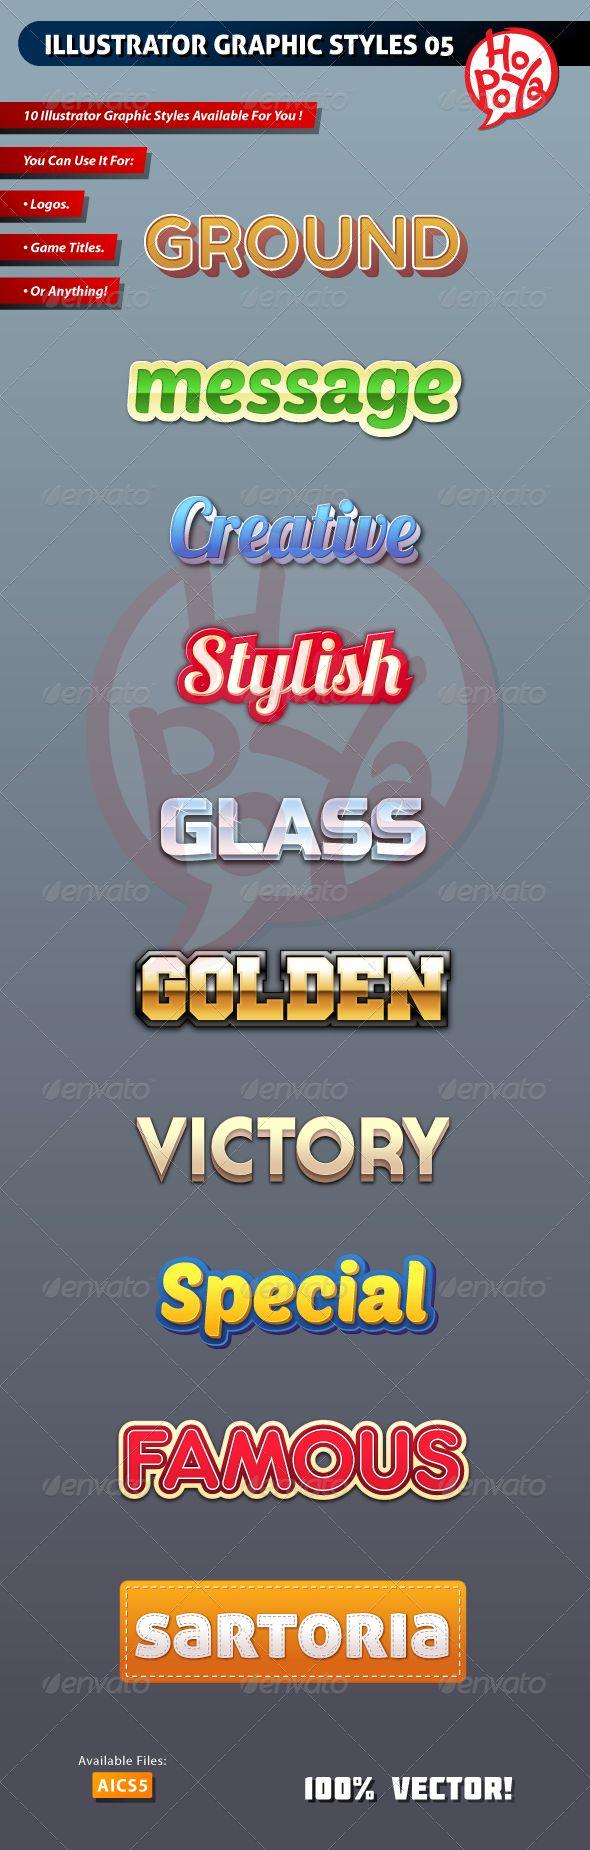 Illustrator Graphic Styles 05